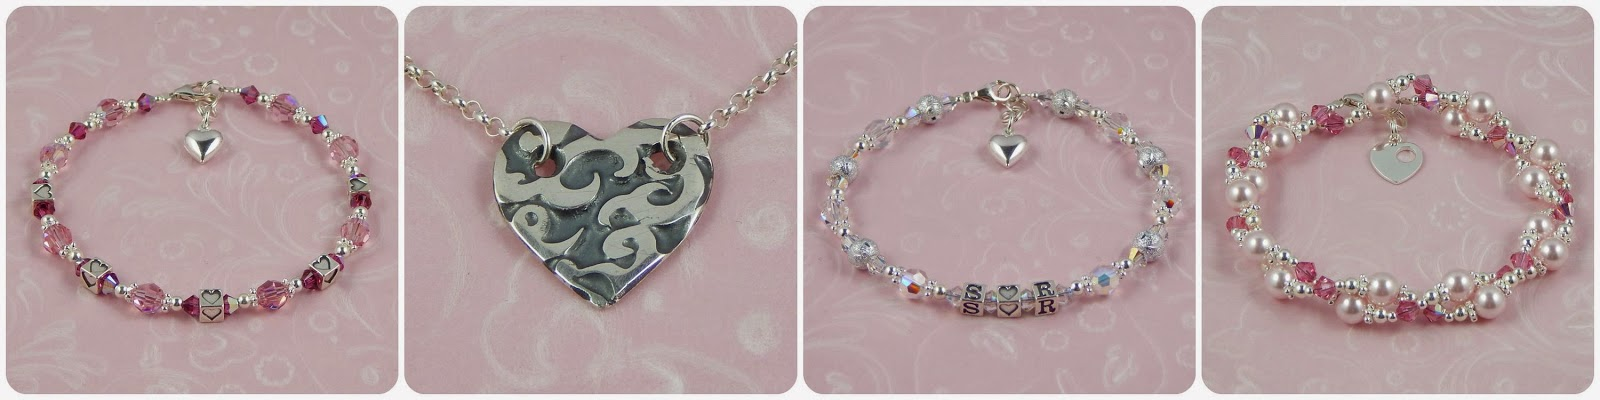 Love jewellery range